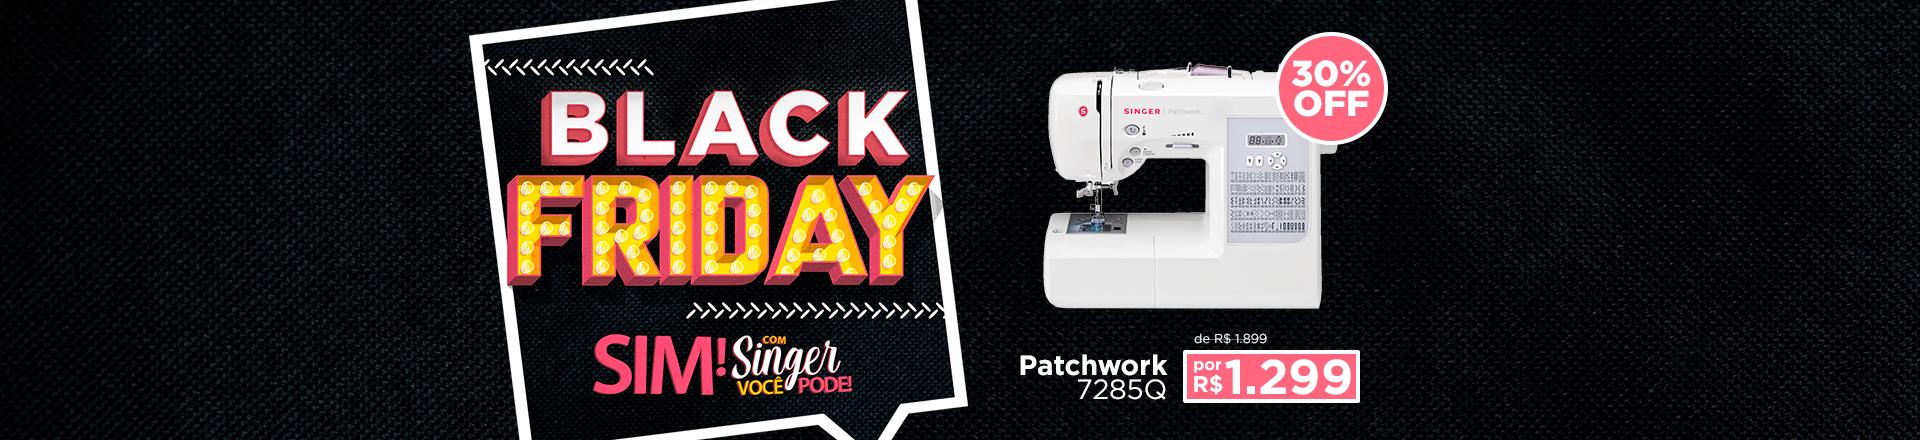 banner-bf-patchwork-7285q-desk